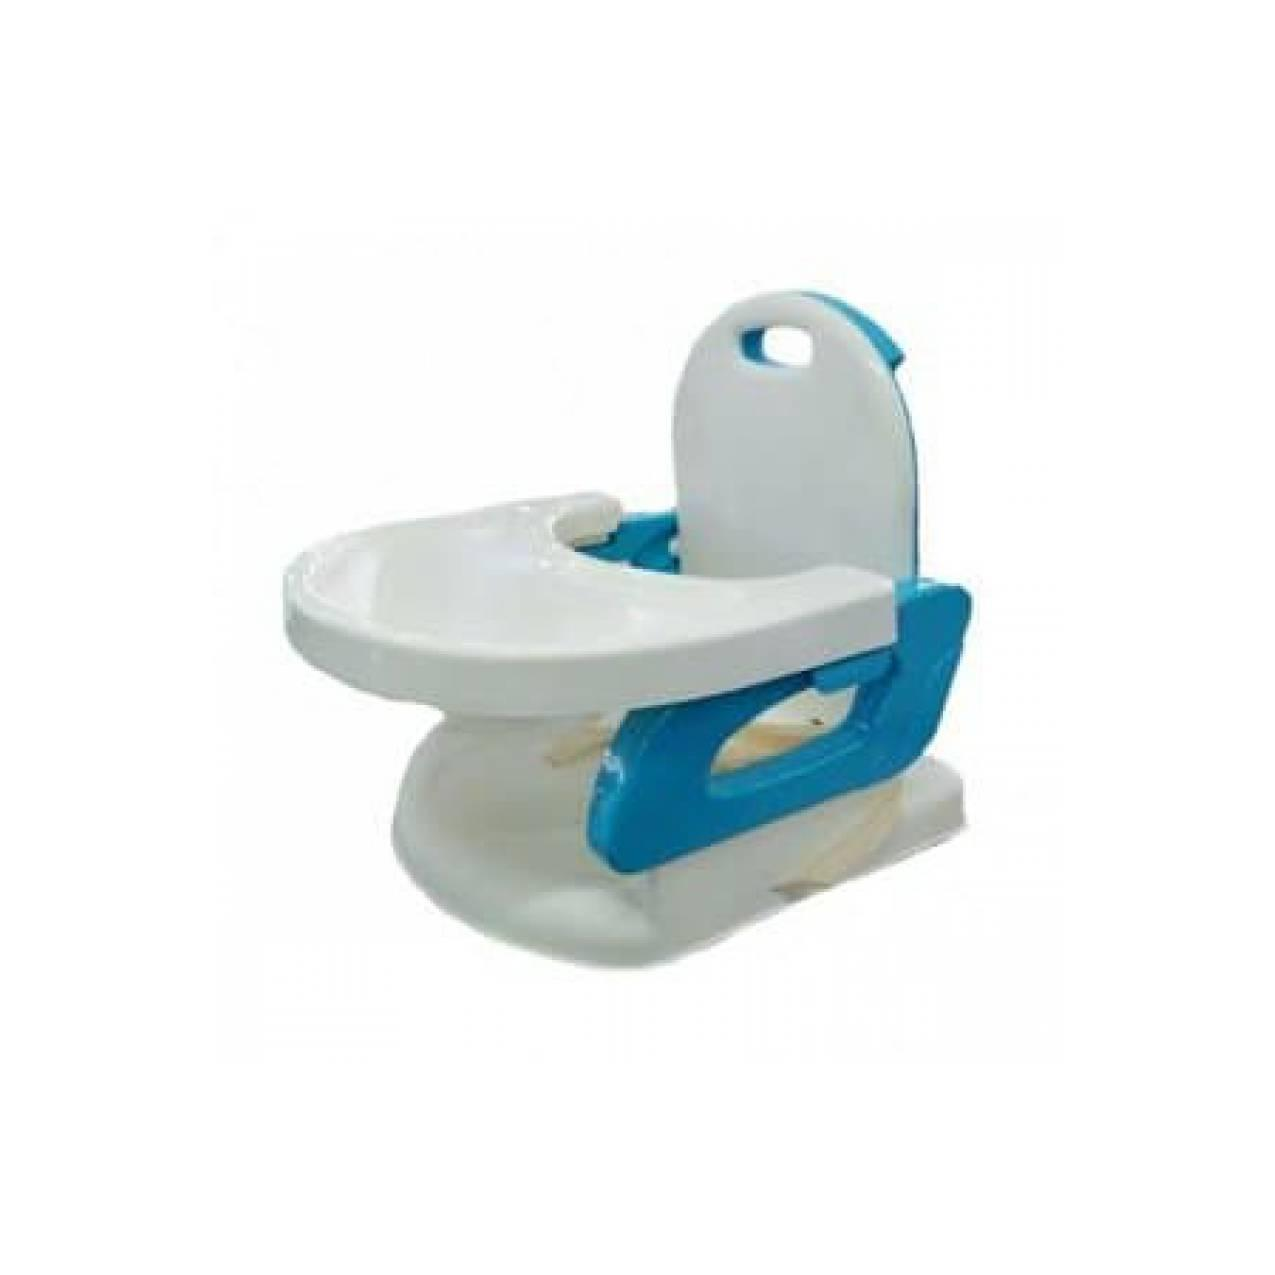 BabyDoes Foldable Booster Seat Blue 07336 - Kursi Bayi Murah